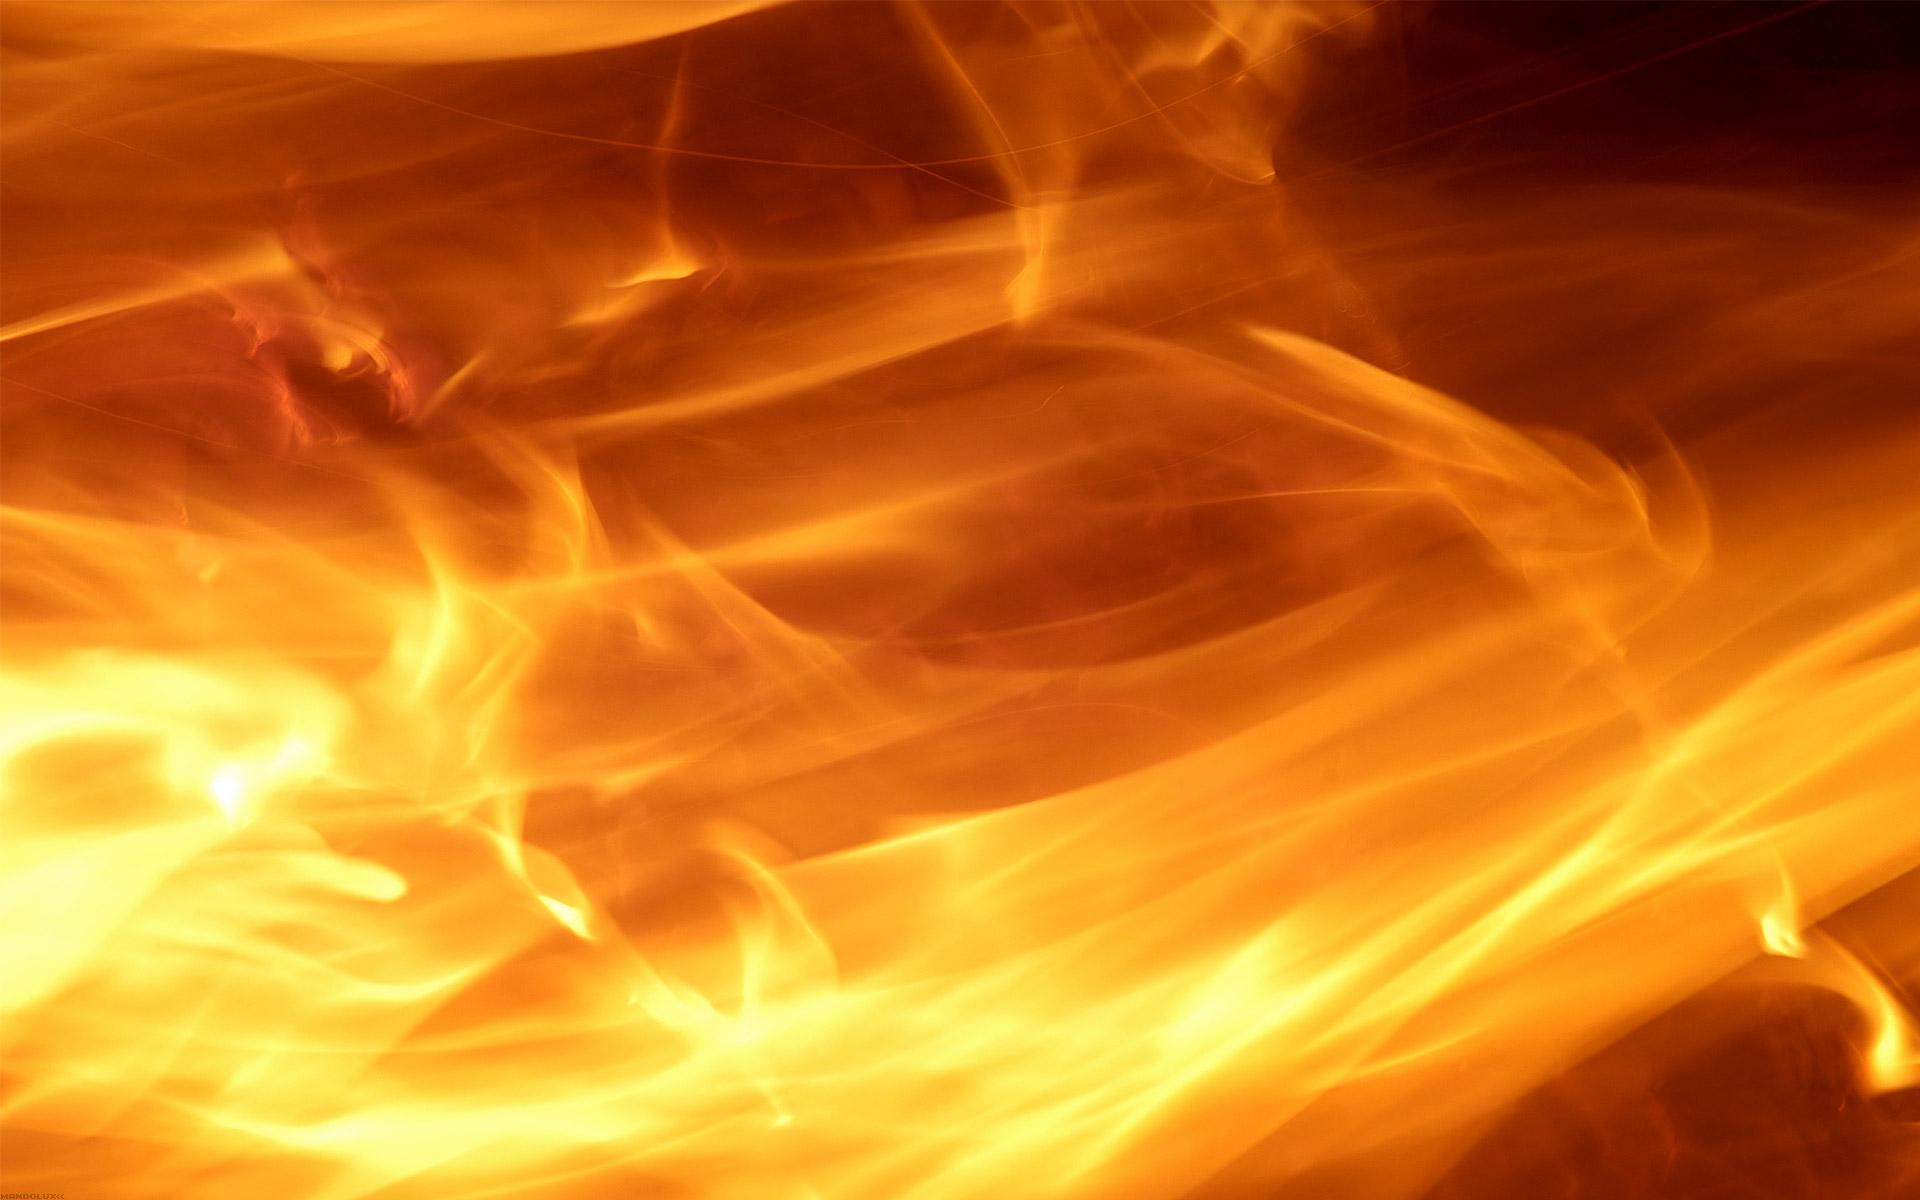 поговорим том, картинка всполохи огня необходимо